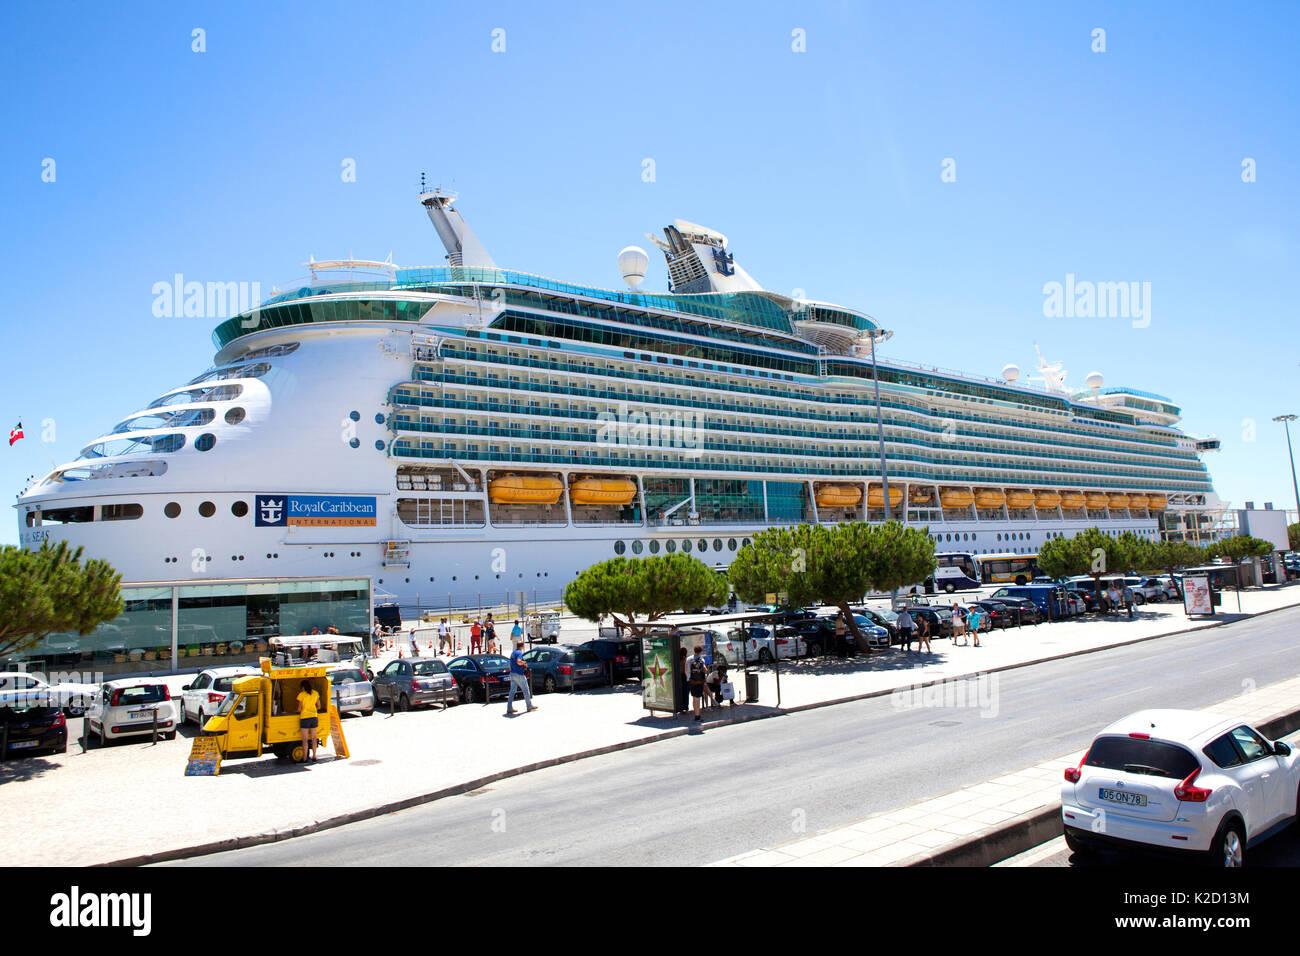 Royal Caribbean Navigator of the Seas, voyager class cruise ship docked at Lisbon Portugal Stock Photo